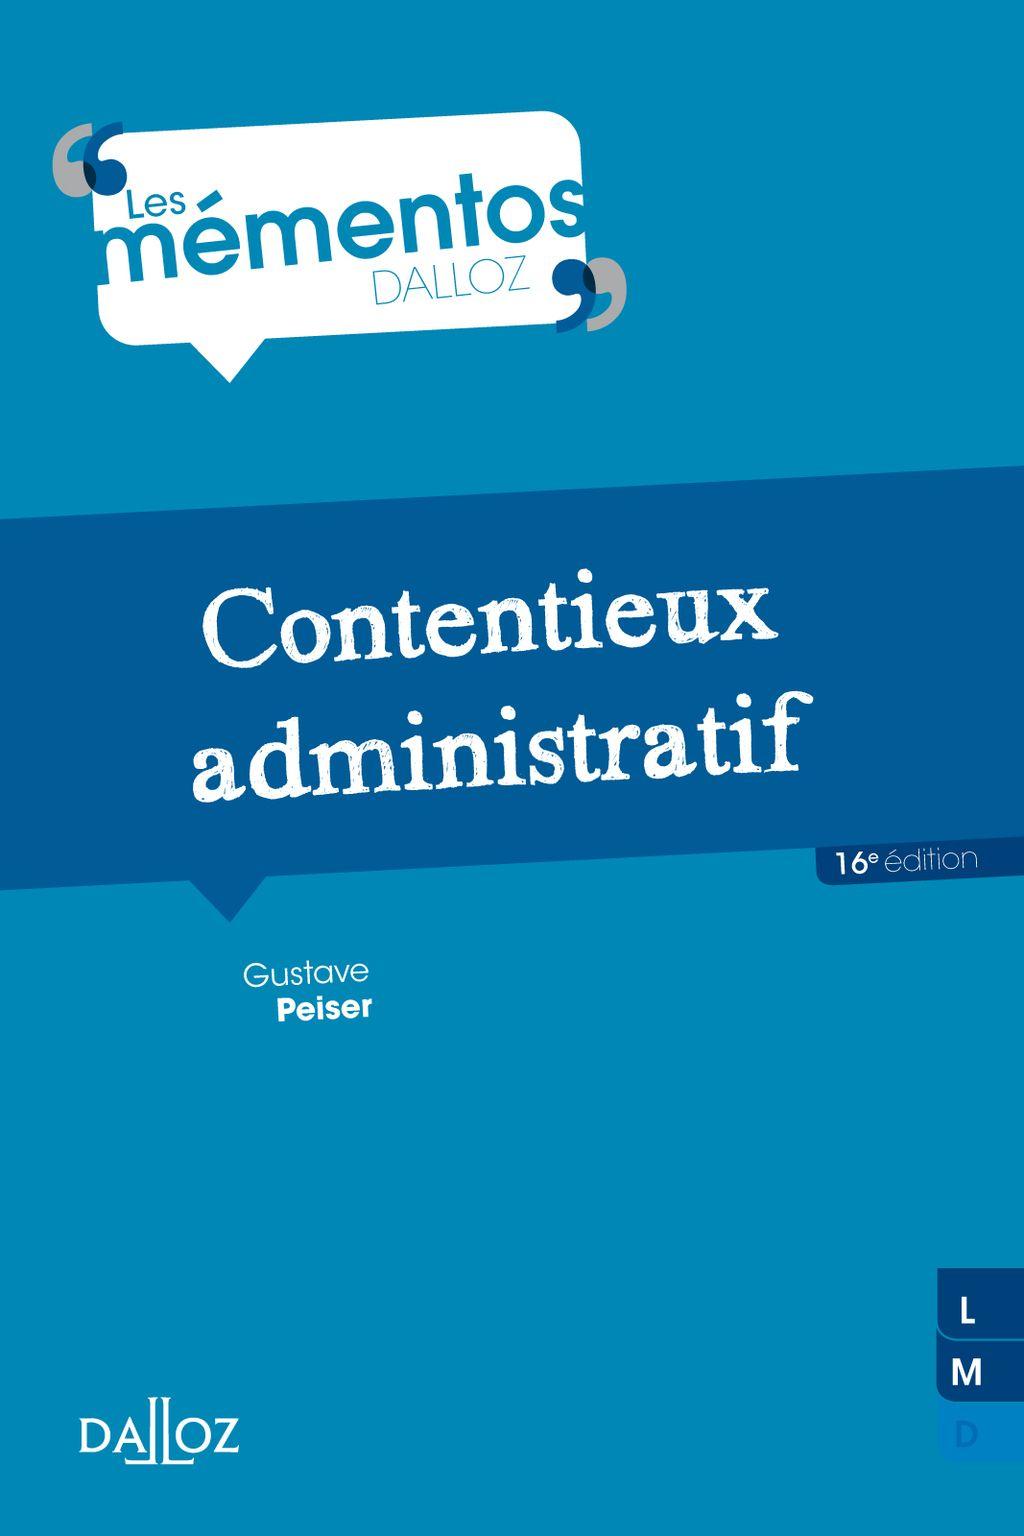 Contentieux Administratif Ebook Ebook Books To Read Ebook Pdf